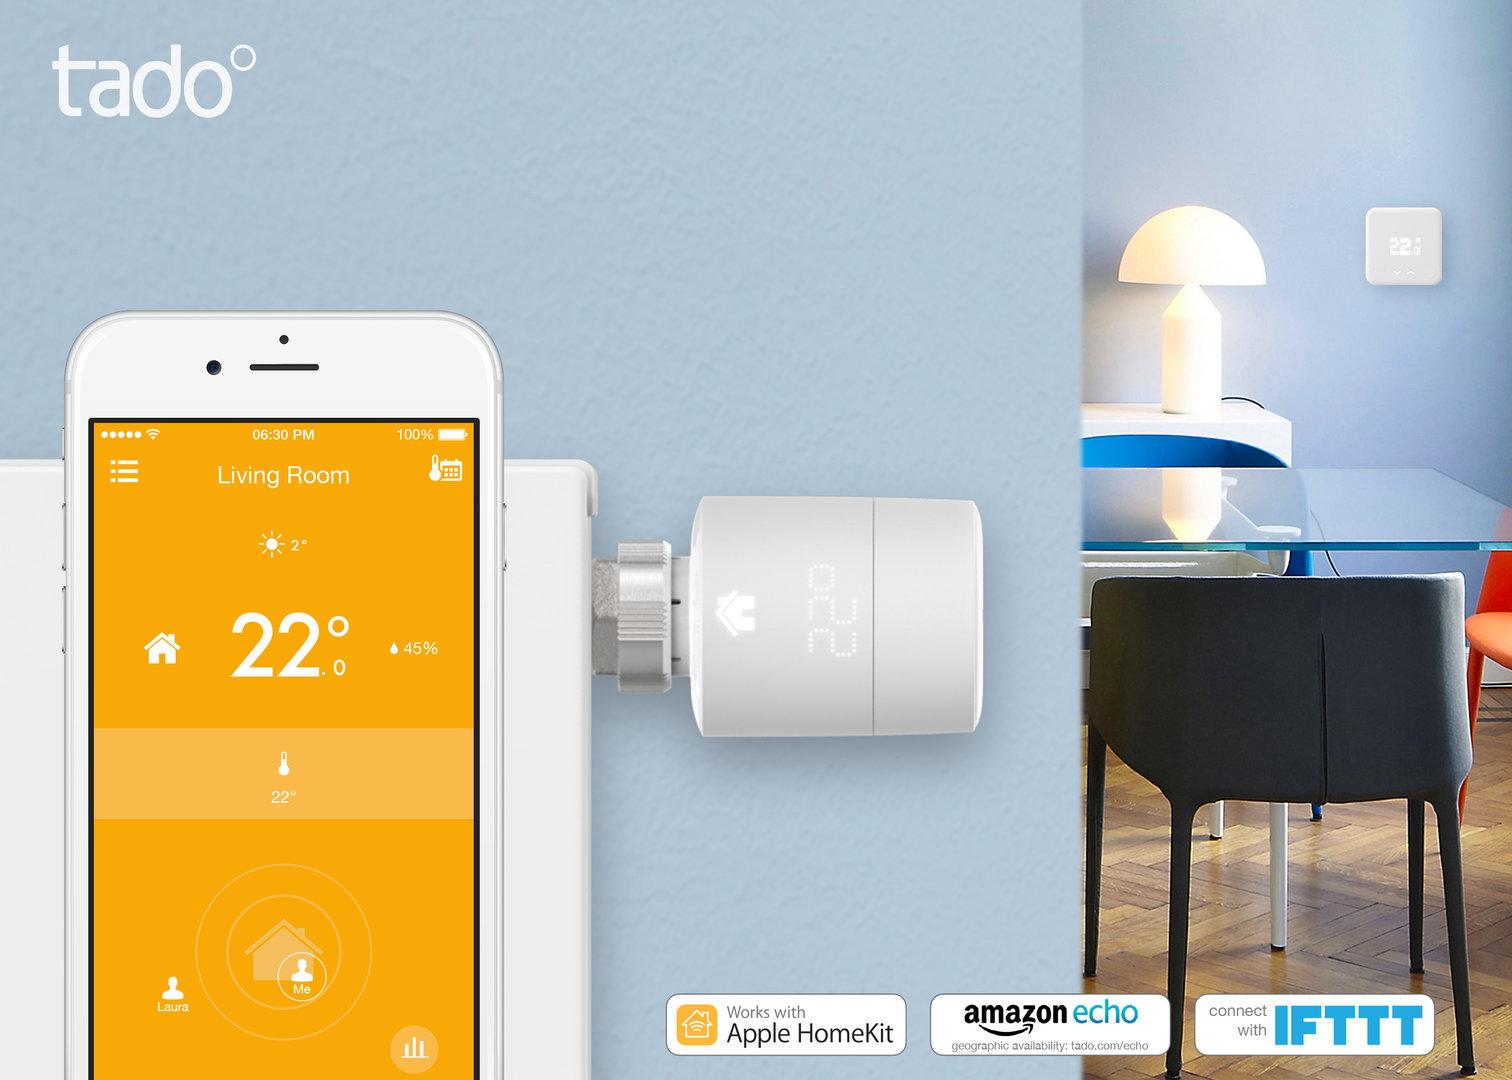 tado° unterstützt Apple HomeKit, Amazon Echo und IFTTT